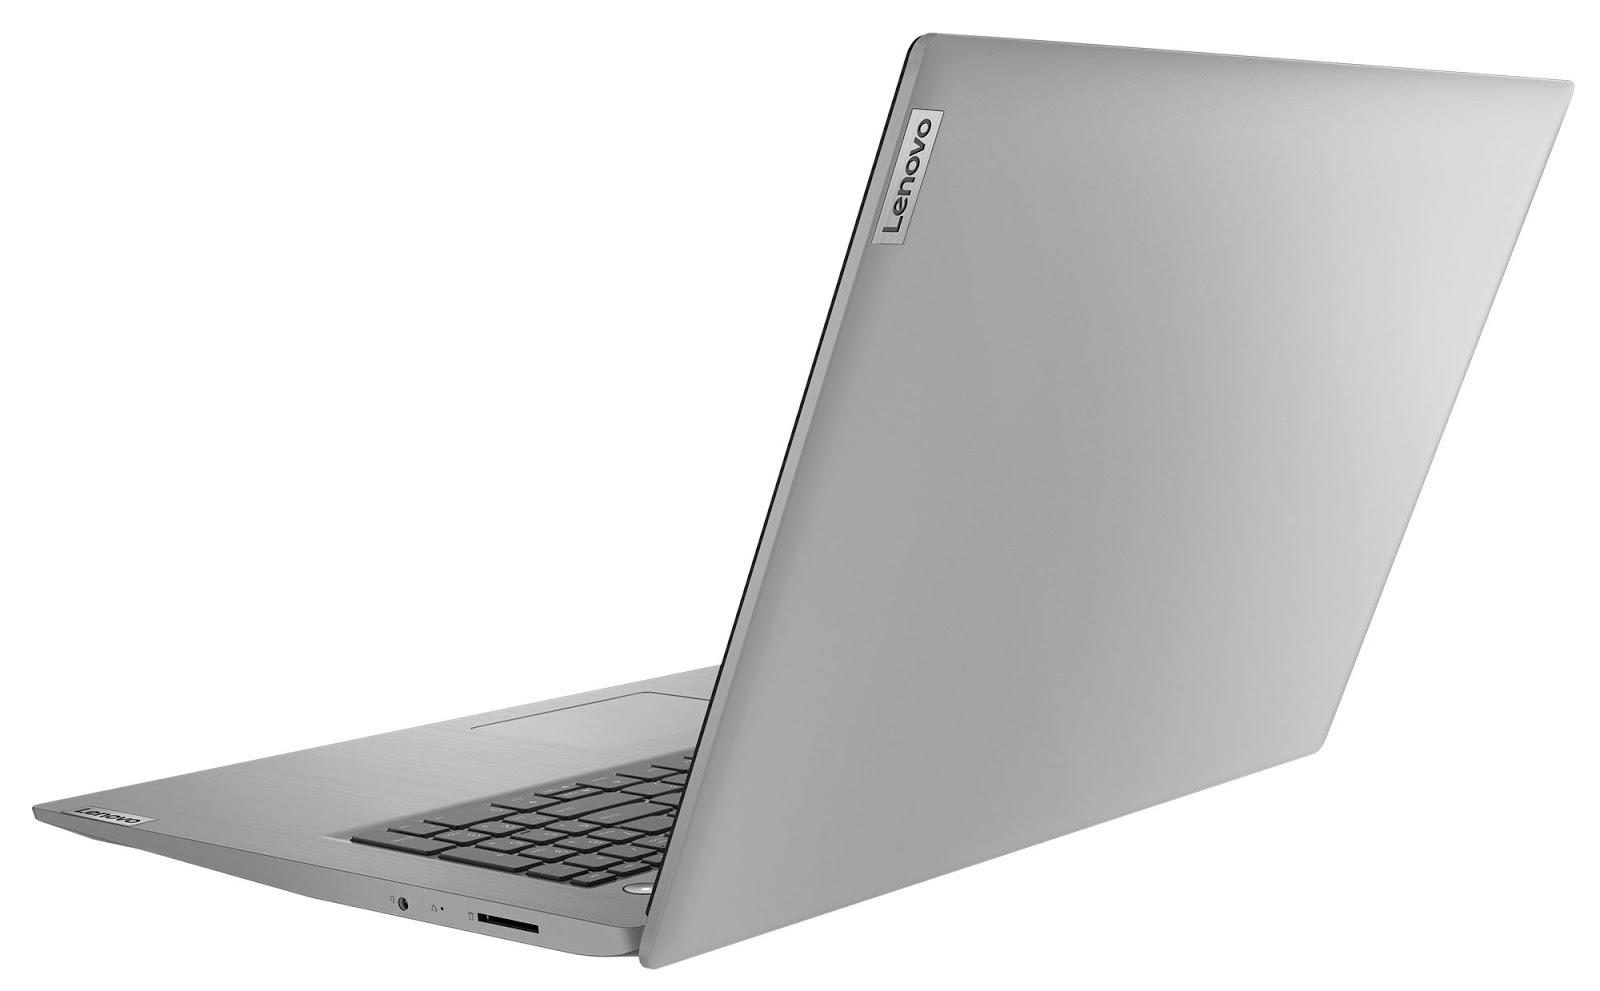 Фото 1. Ноутбук Lenovo ideapad 3 17IML05 Platinum Grey (81WC004YRE)